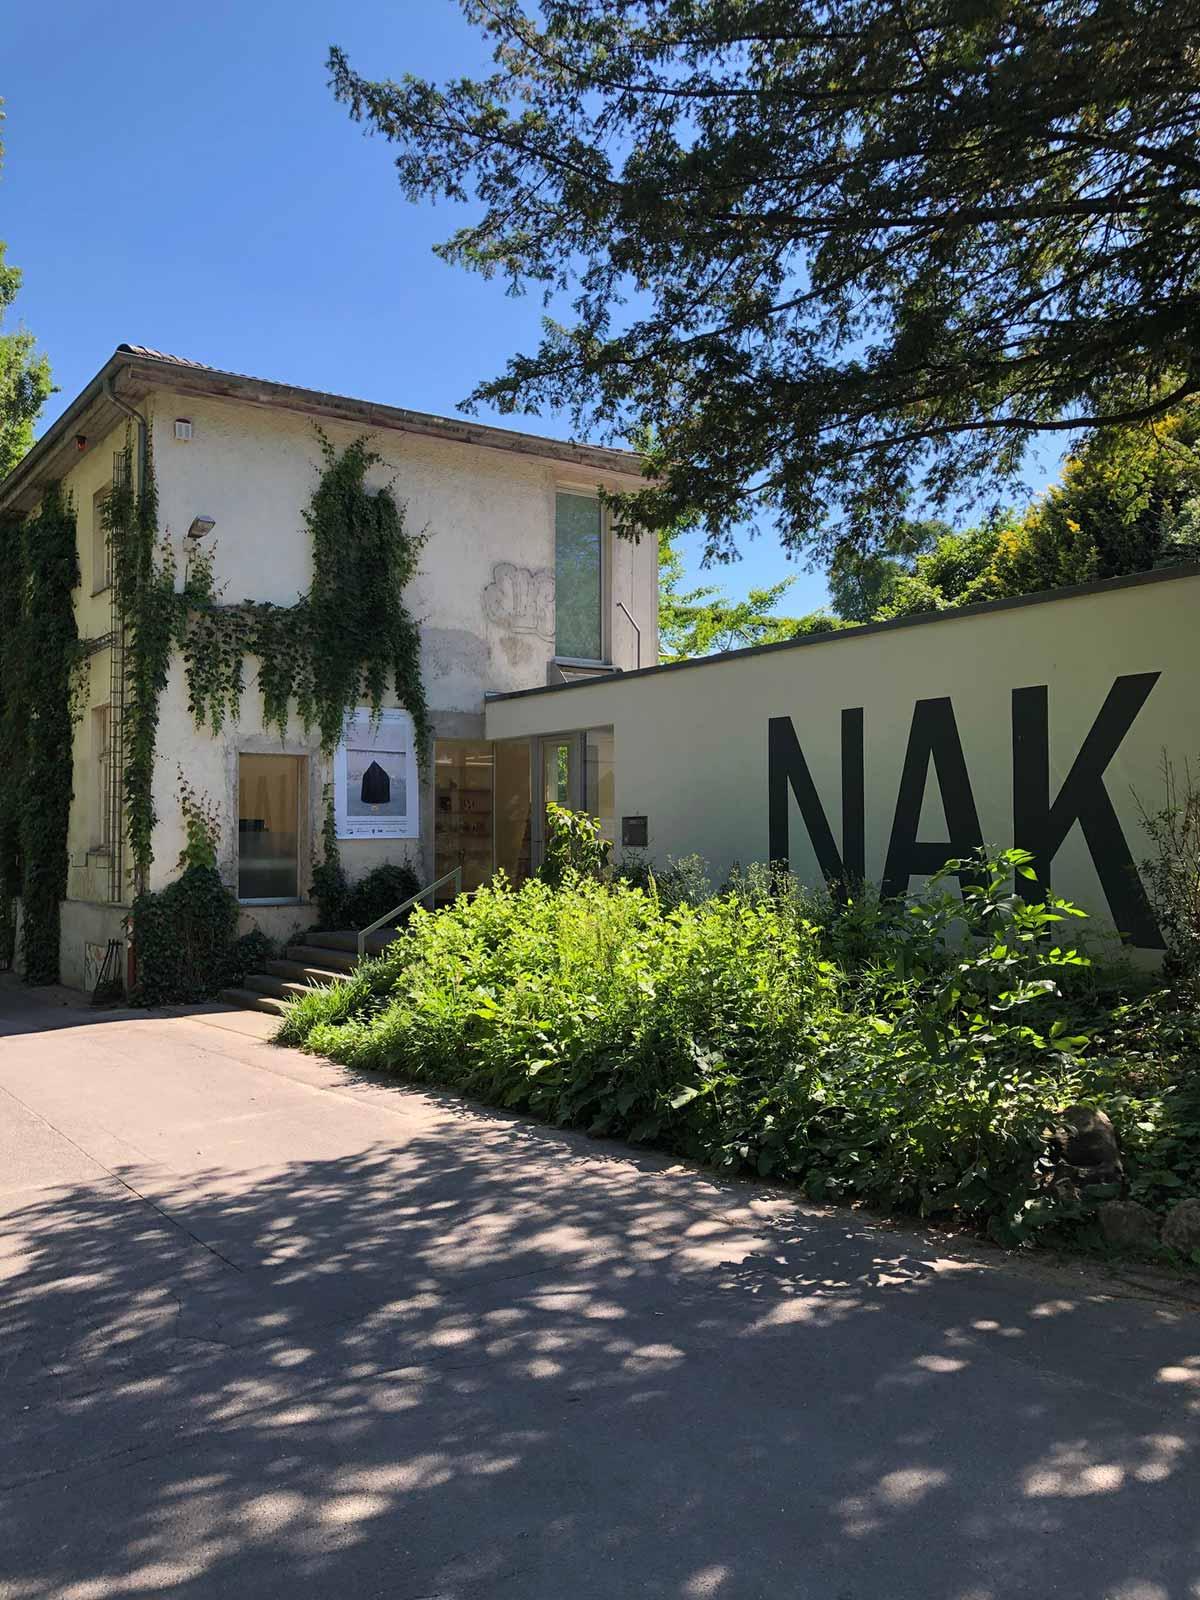 neuer aachener kunstverein, historical building, exhibitions, shows, emerging art